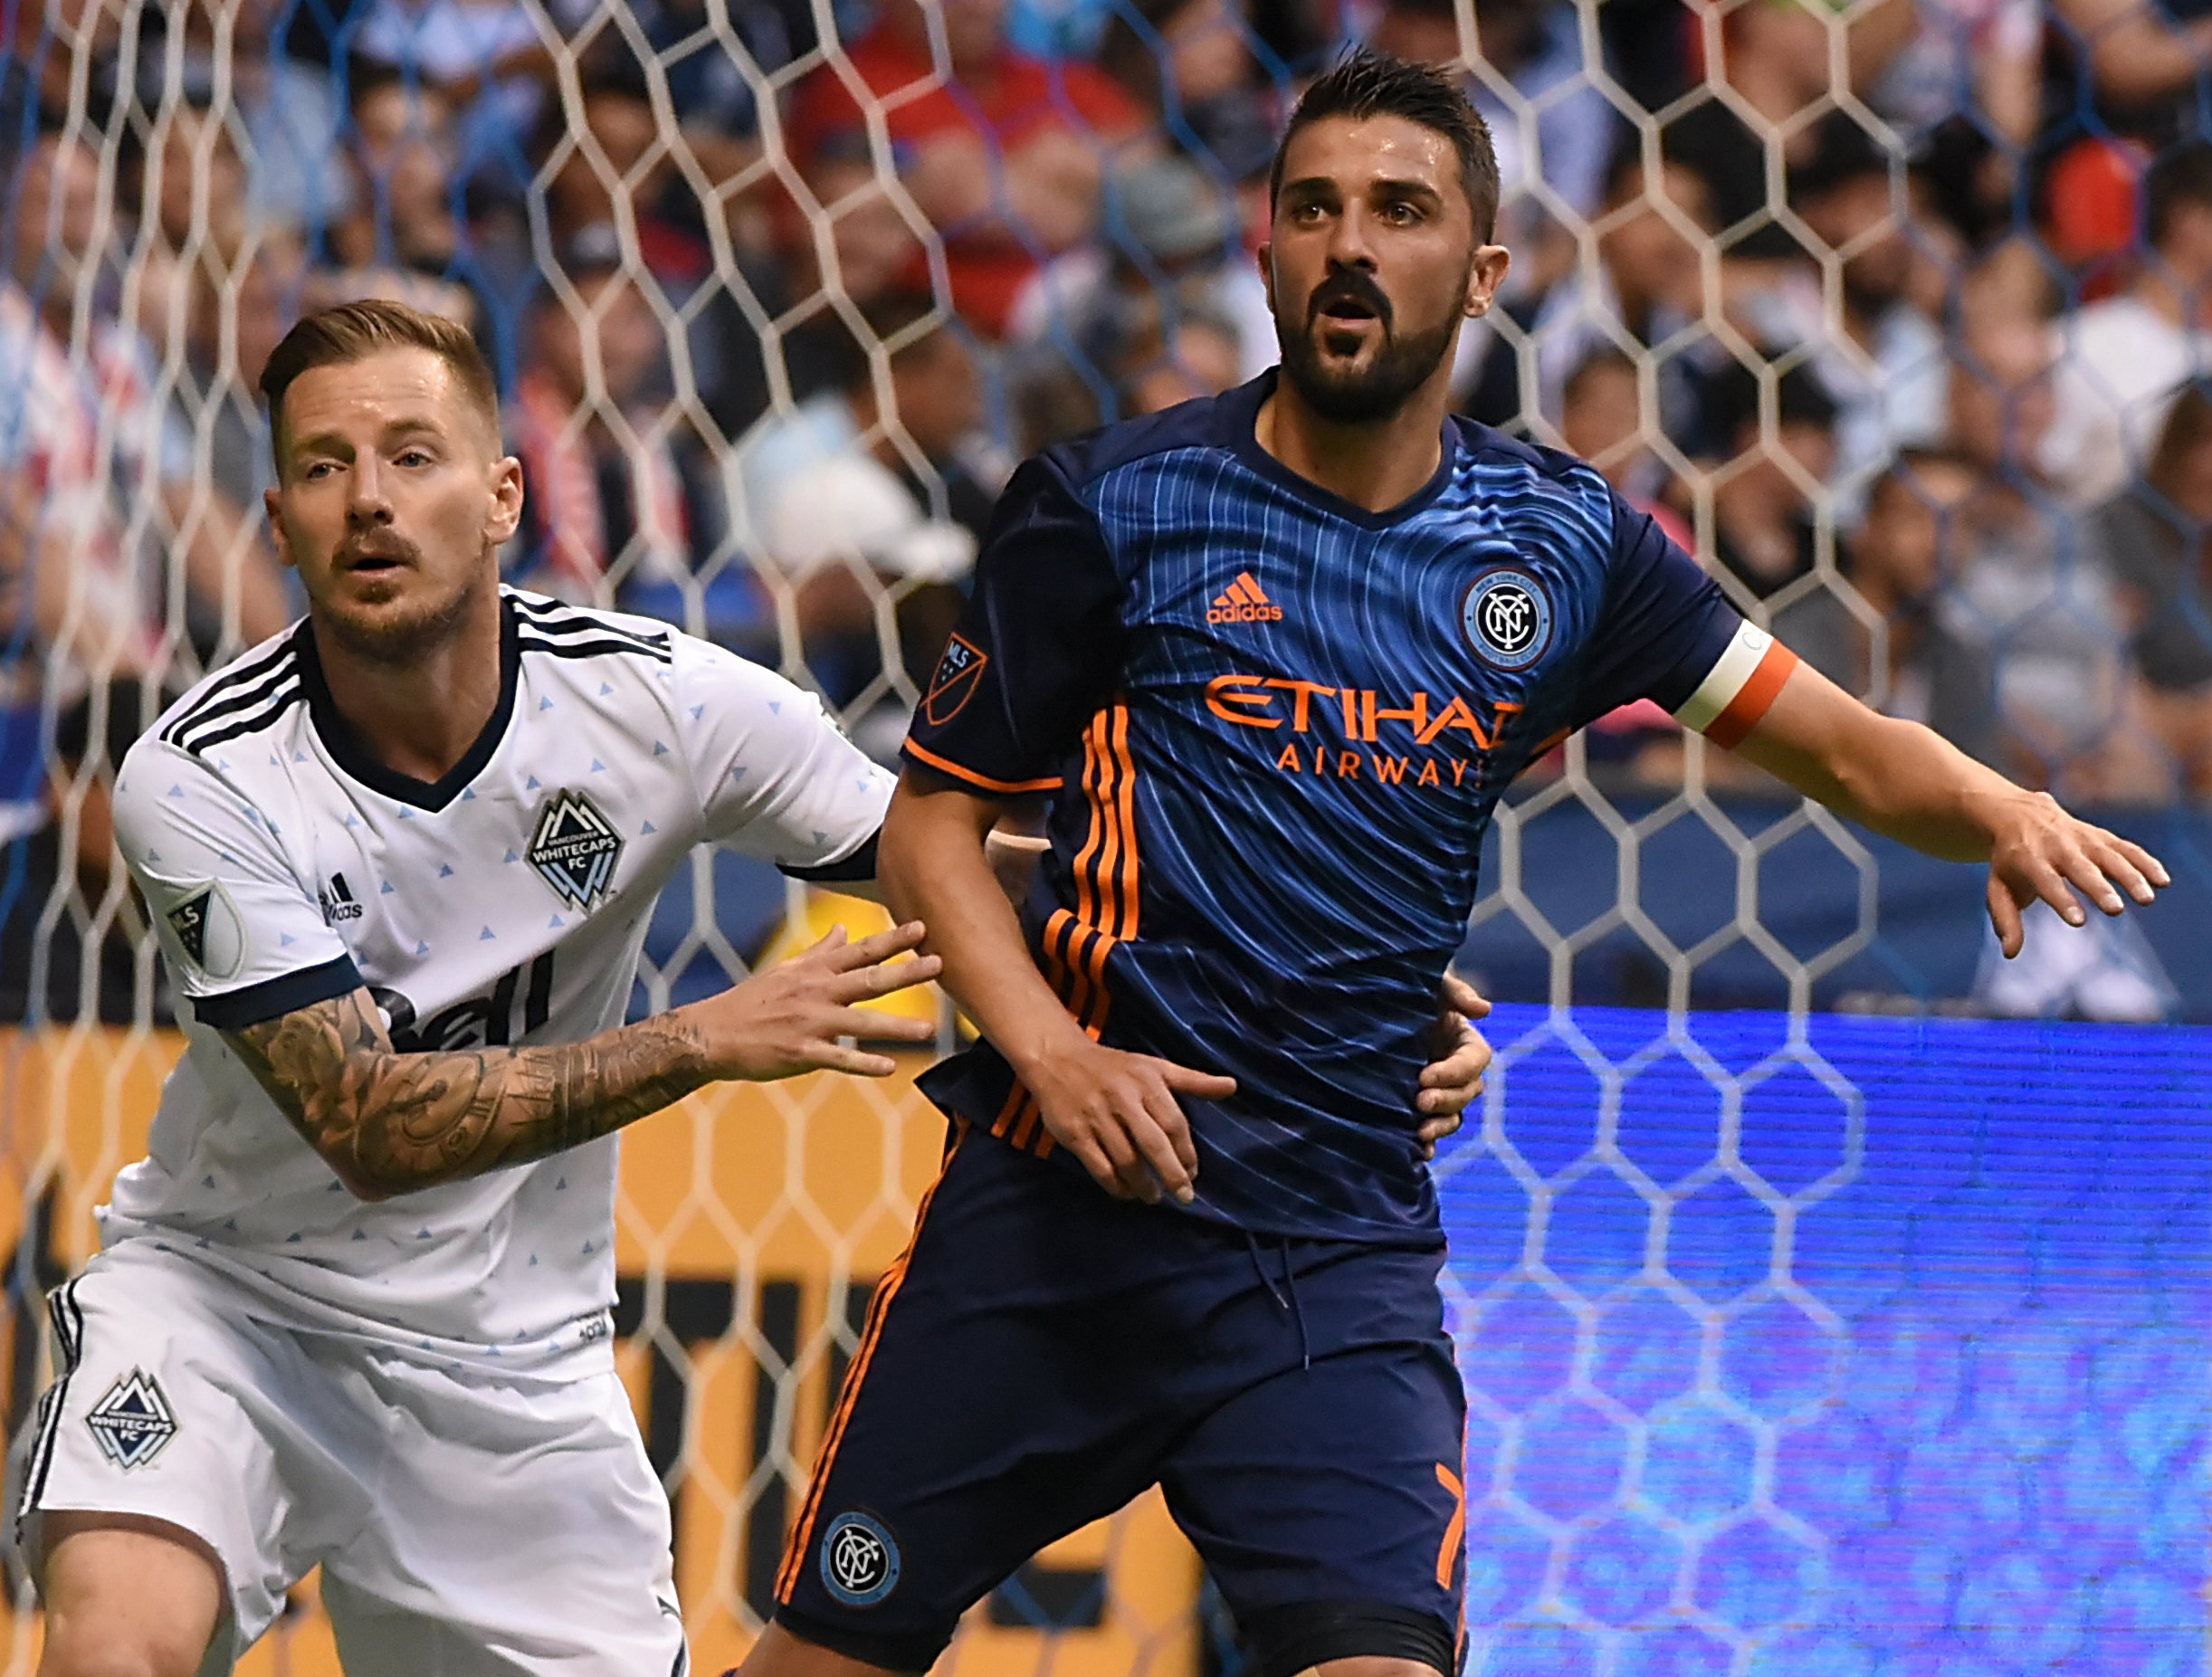 MLS: New York City FC at Vancouver Whitecaps FC